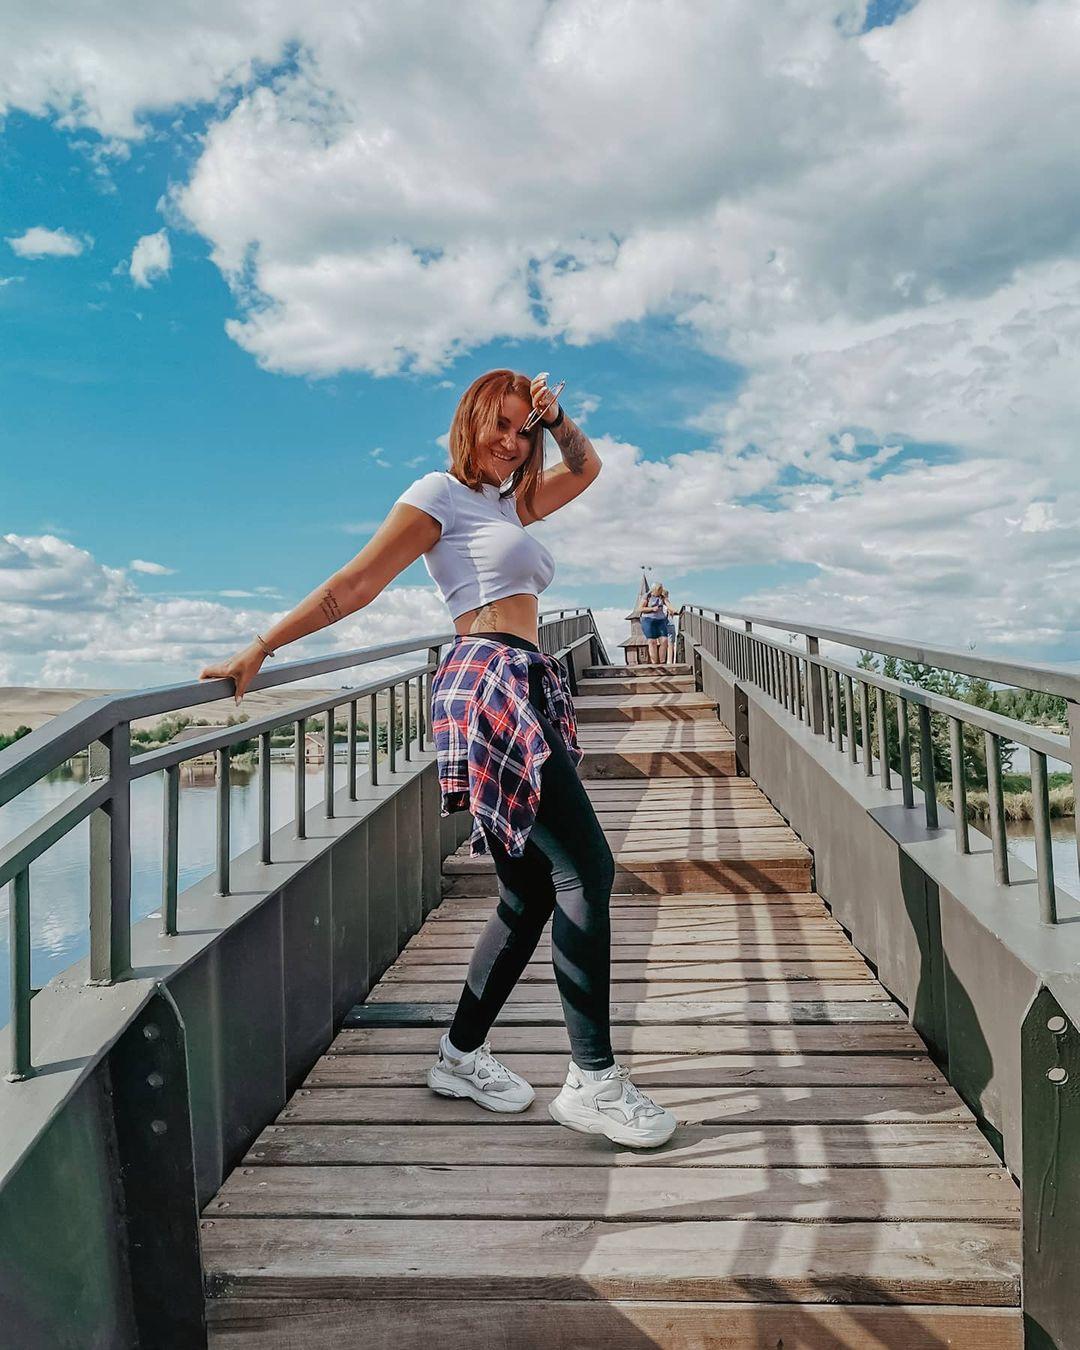 Anastasia-Nikolskaya-Wallpapers-Insta-Fit-Bio-5